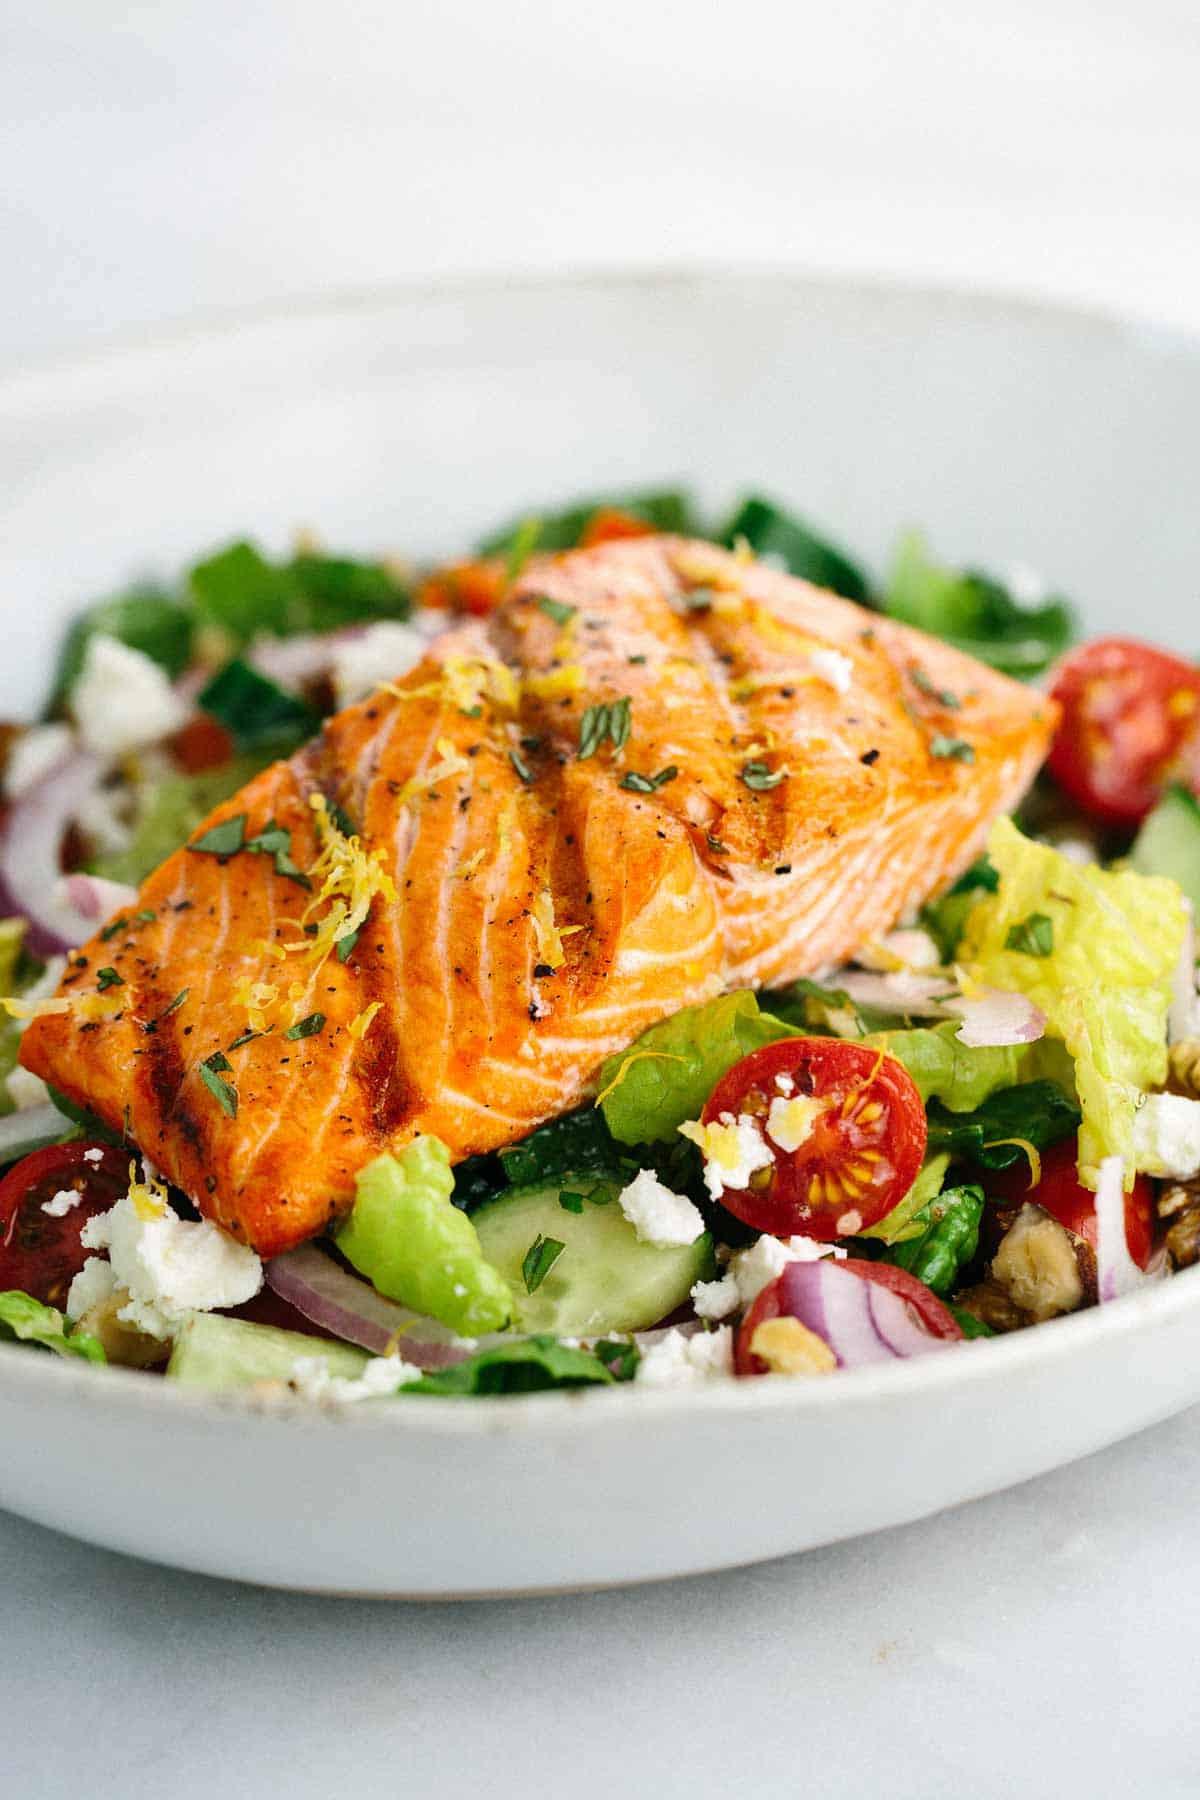 Salmon Salad Recipe Healthy  Grilled Salmon Greek Salad with Lemon Basil Dressing